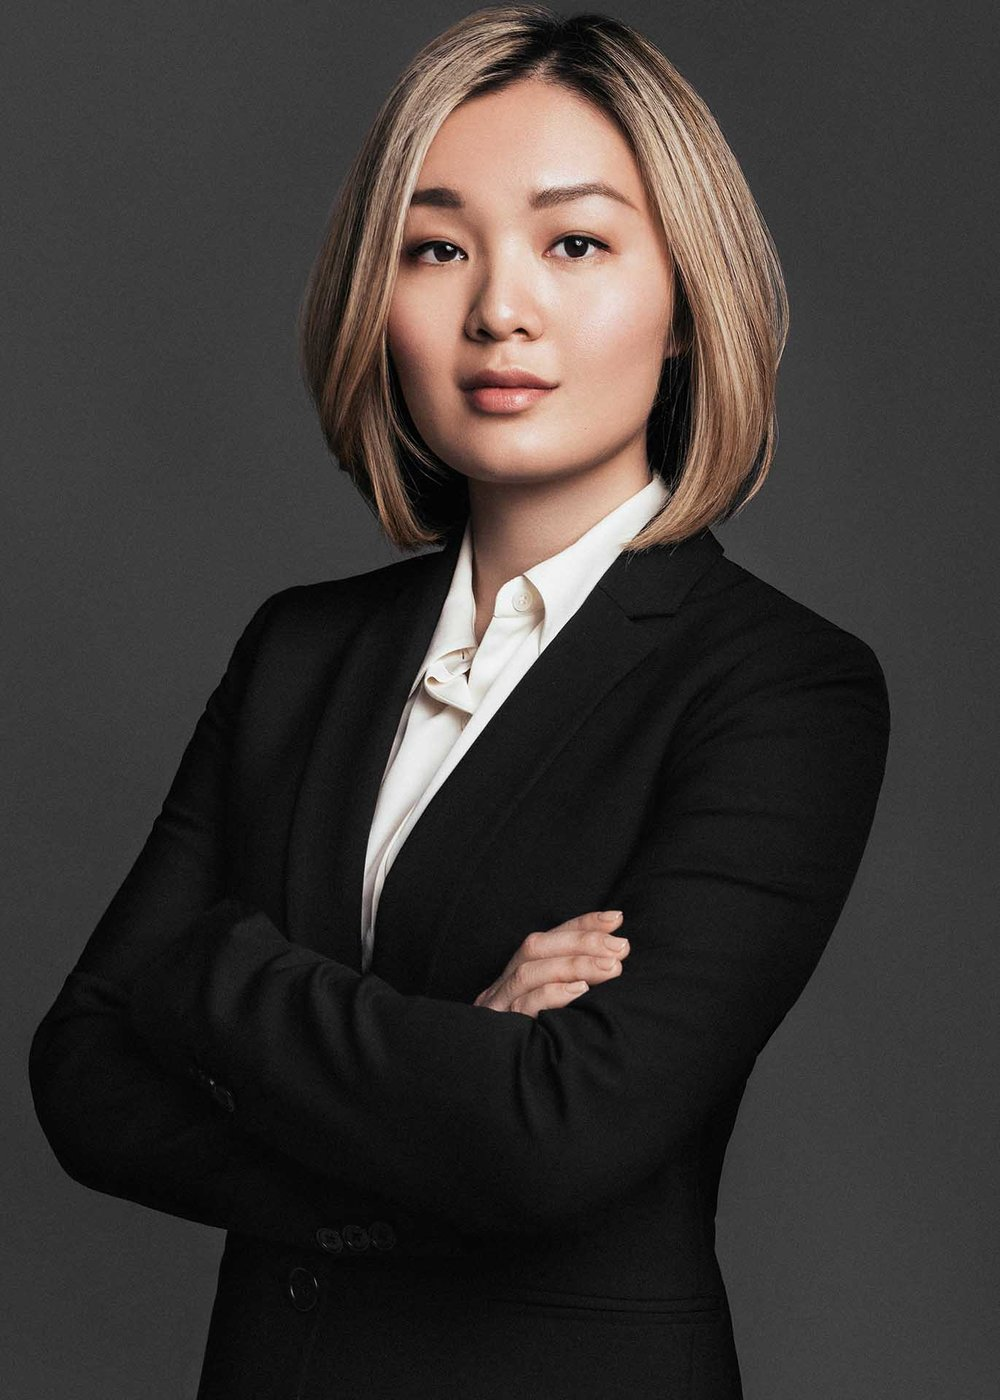 Hedshots-NYC-Profeesional-CEOportraits-6-2.jpg